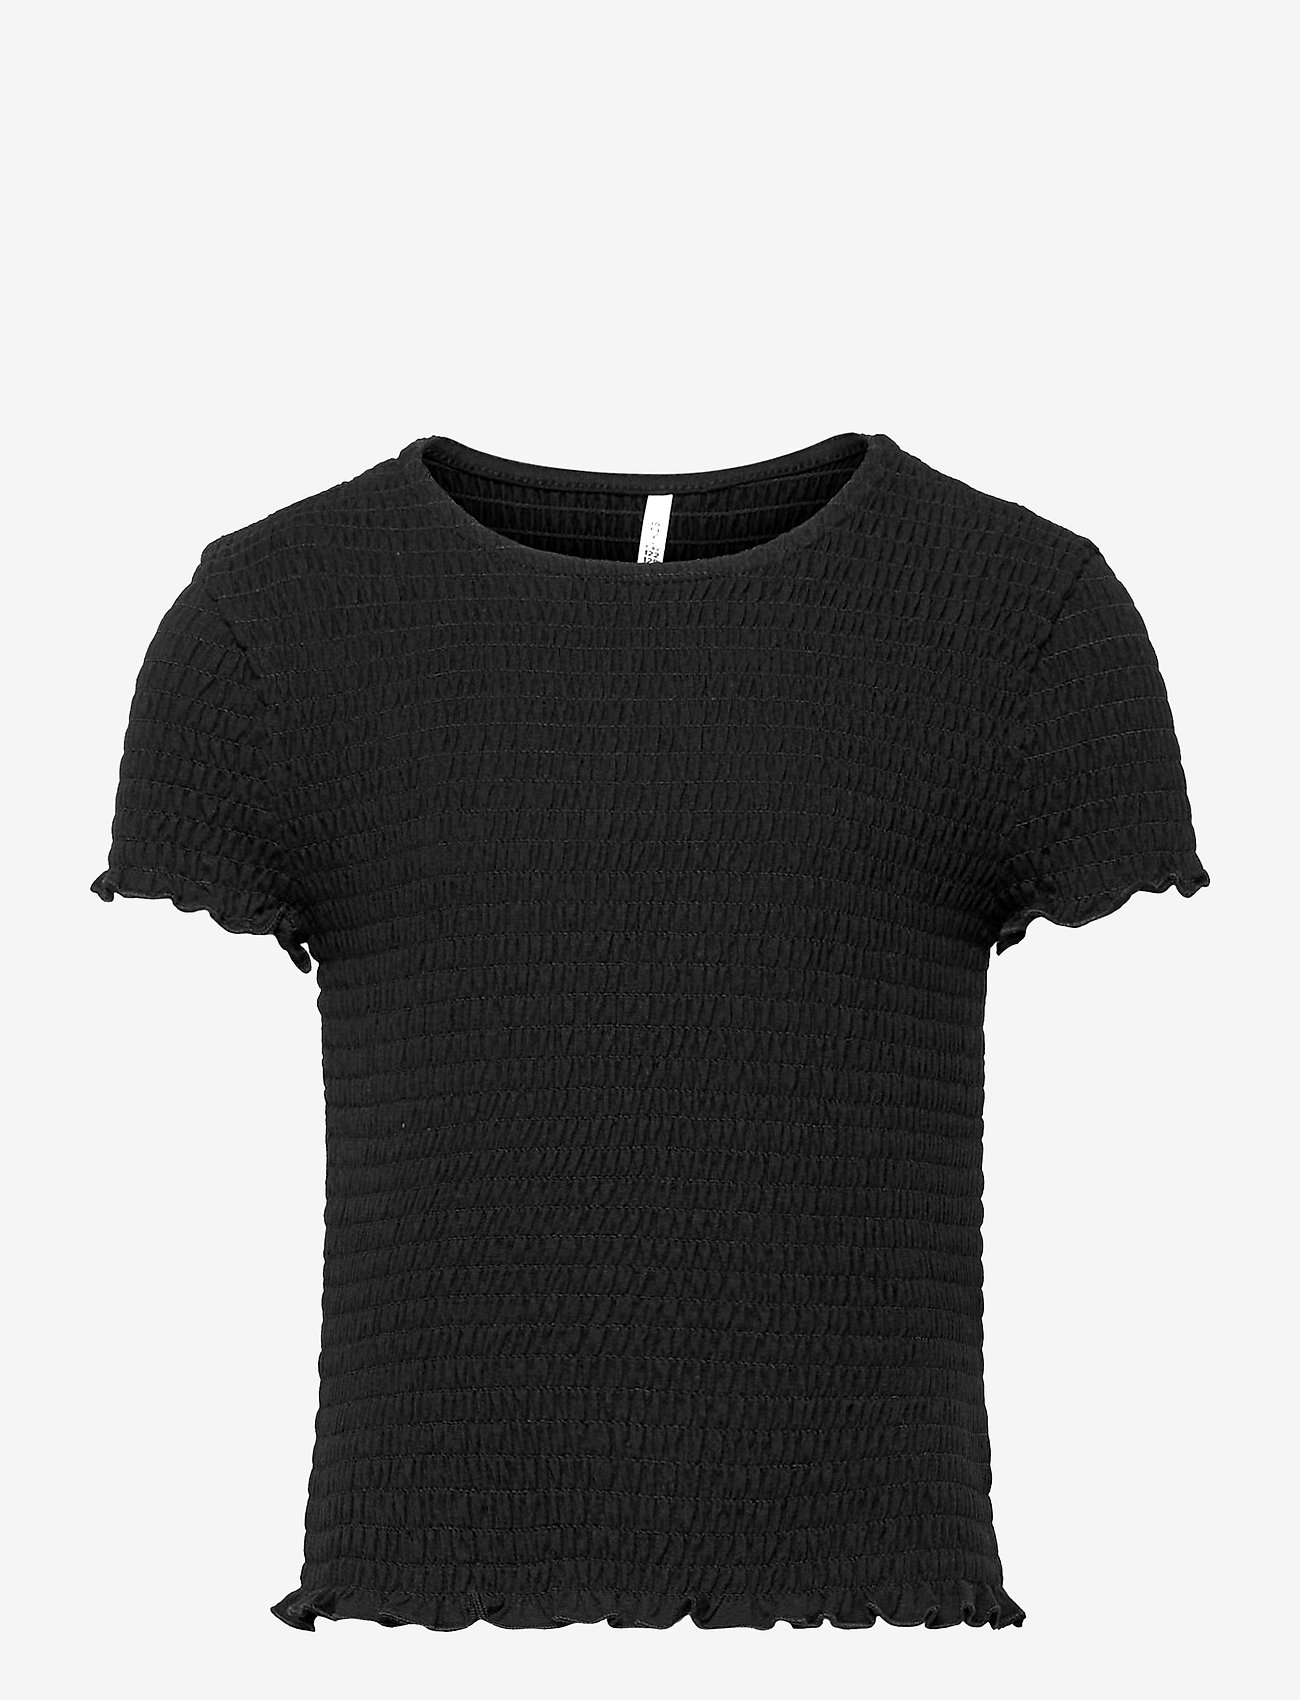 Kids Only - KONDELI LIFE S/S SMOCK TOP JRS - t-shirts - black - 0